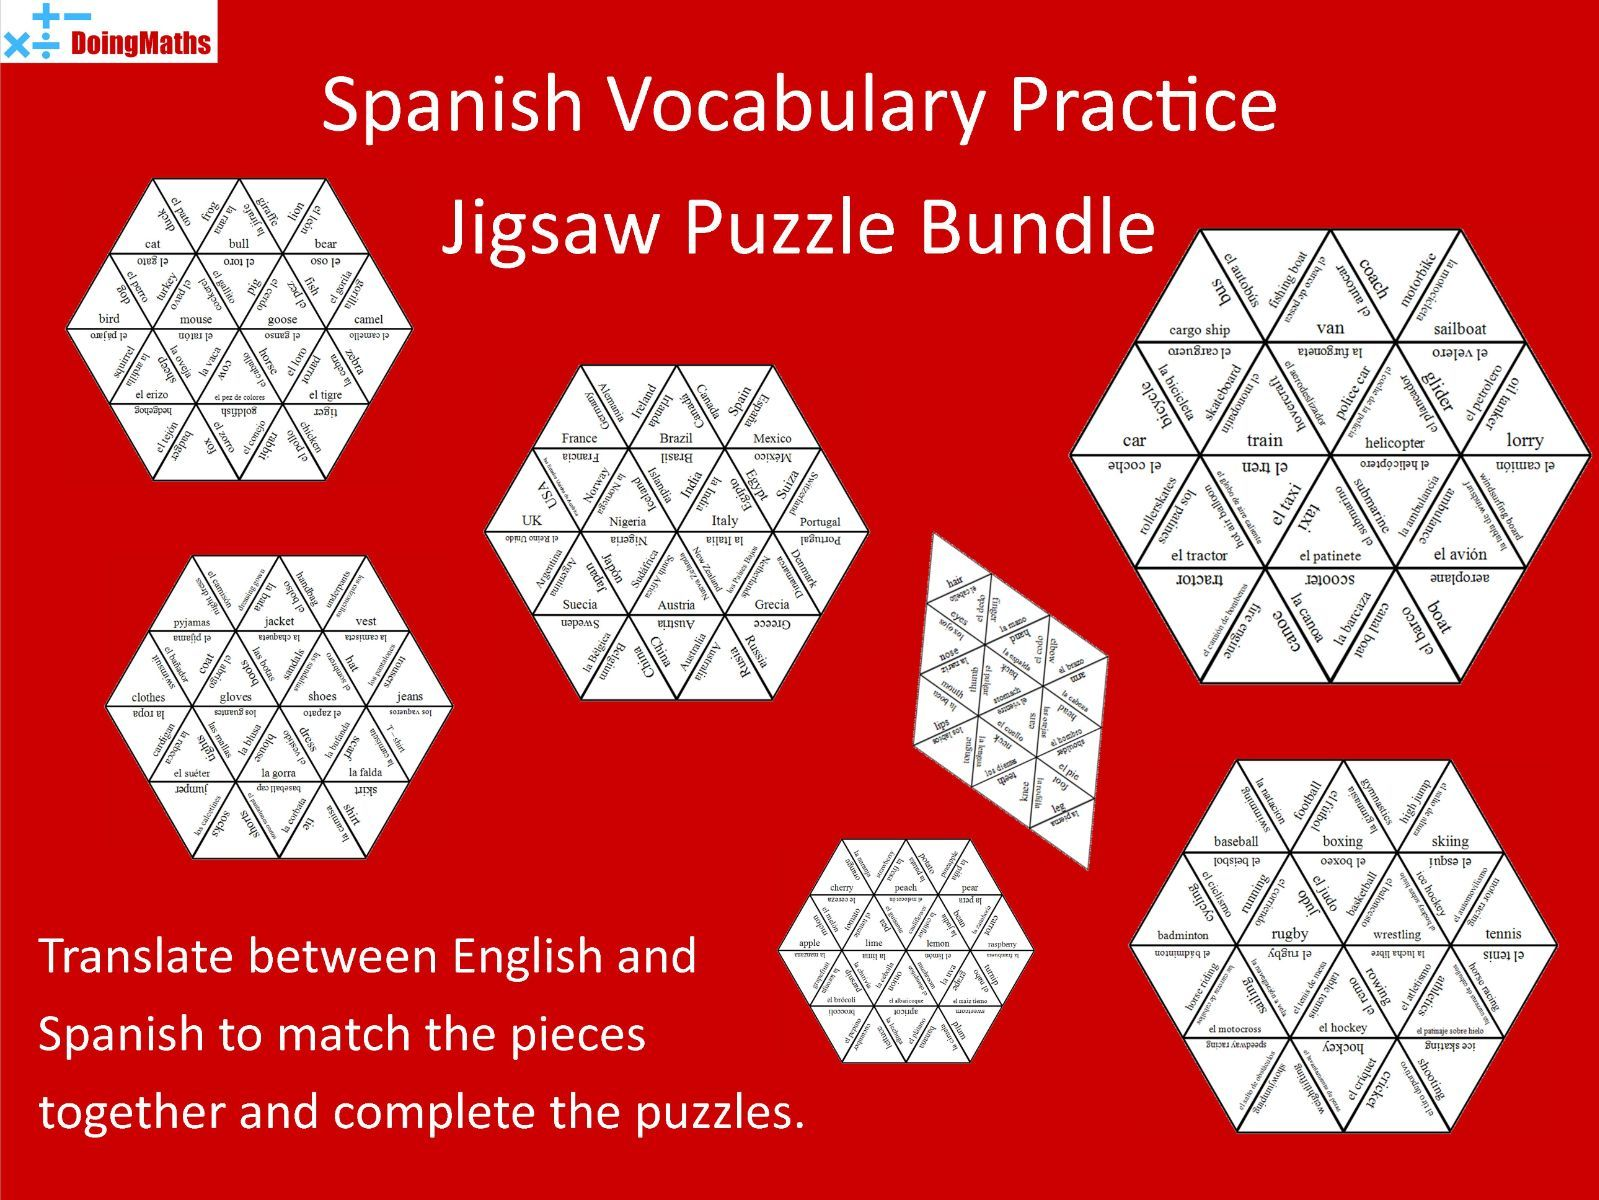 Spanish Vocabulary Practice - Jigsaw Puzzles